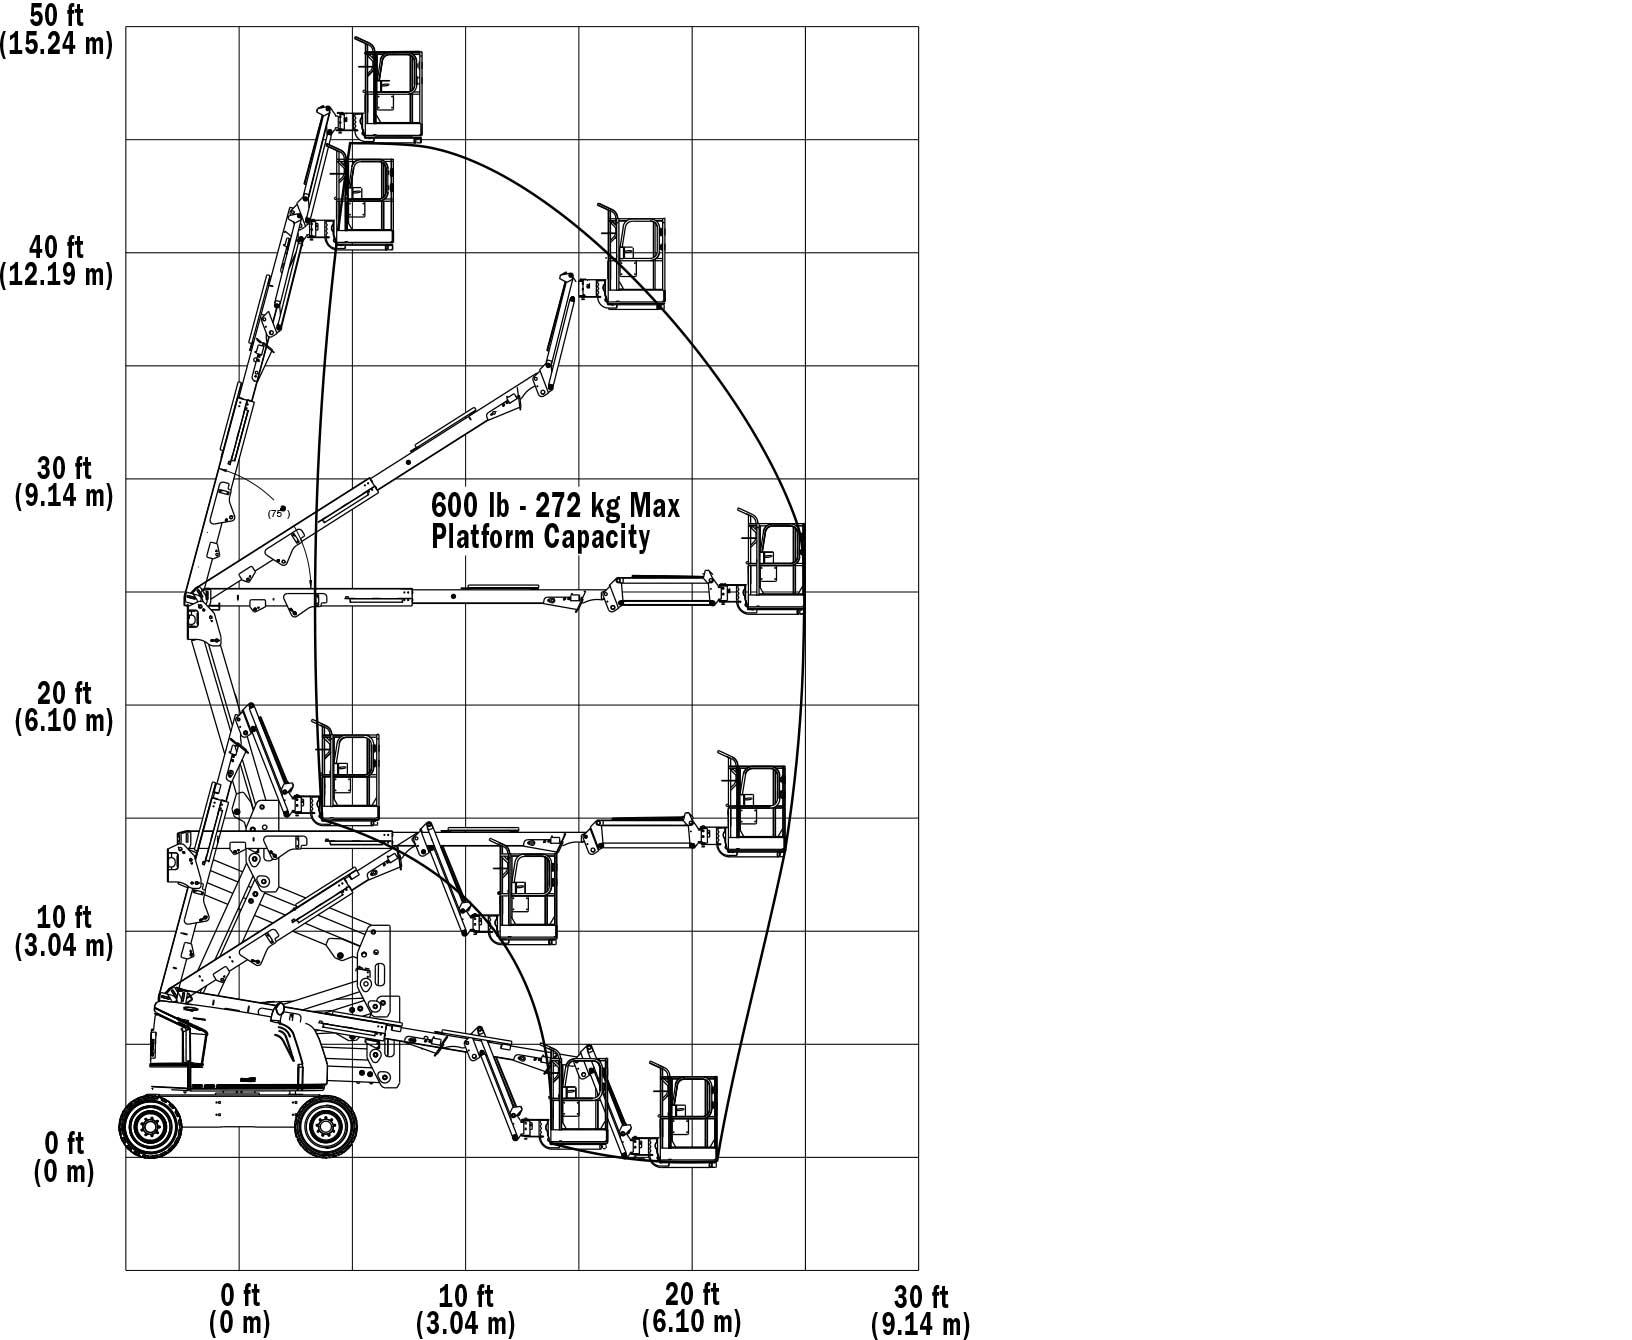 JLG 450AJ Articulating Boom Lift Reach Diagram